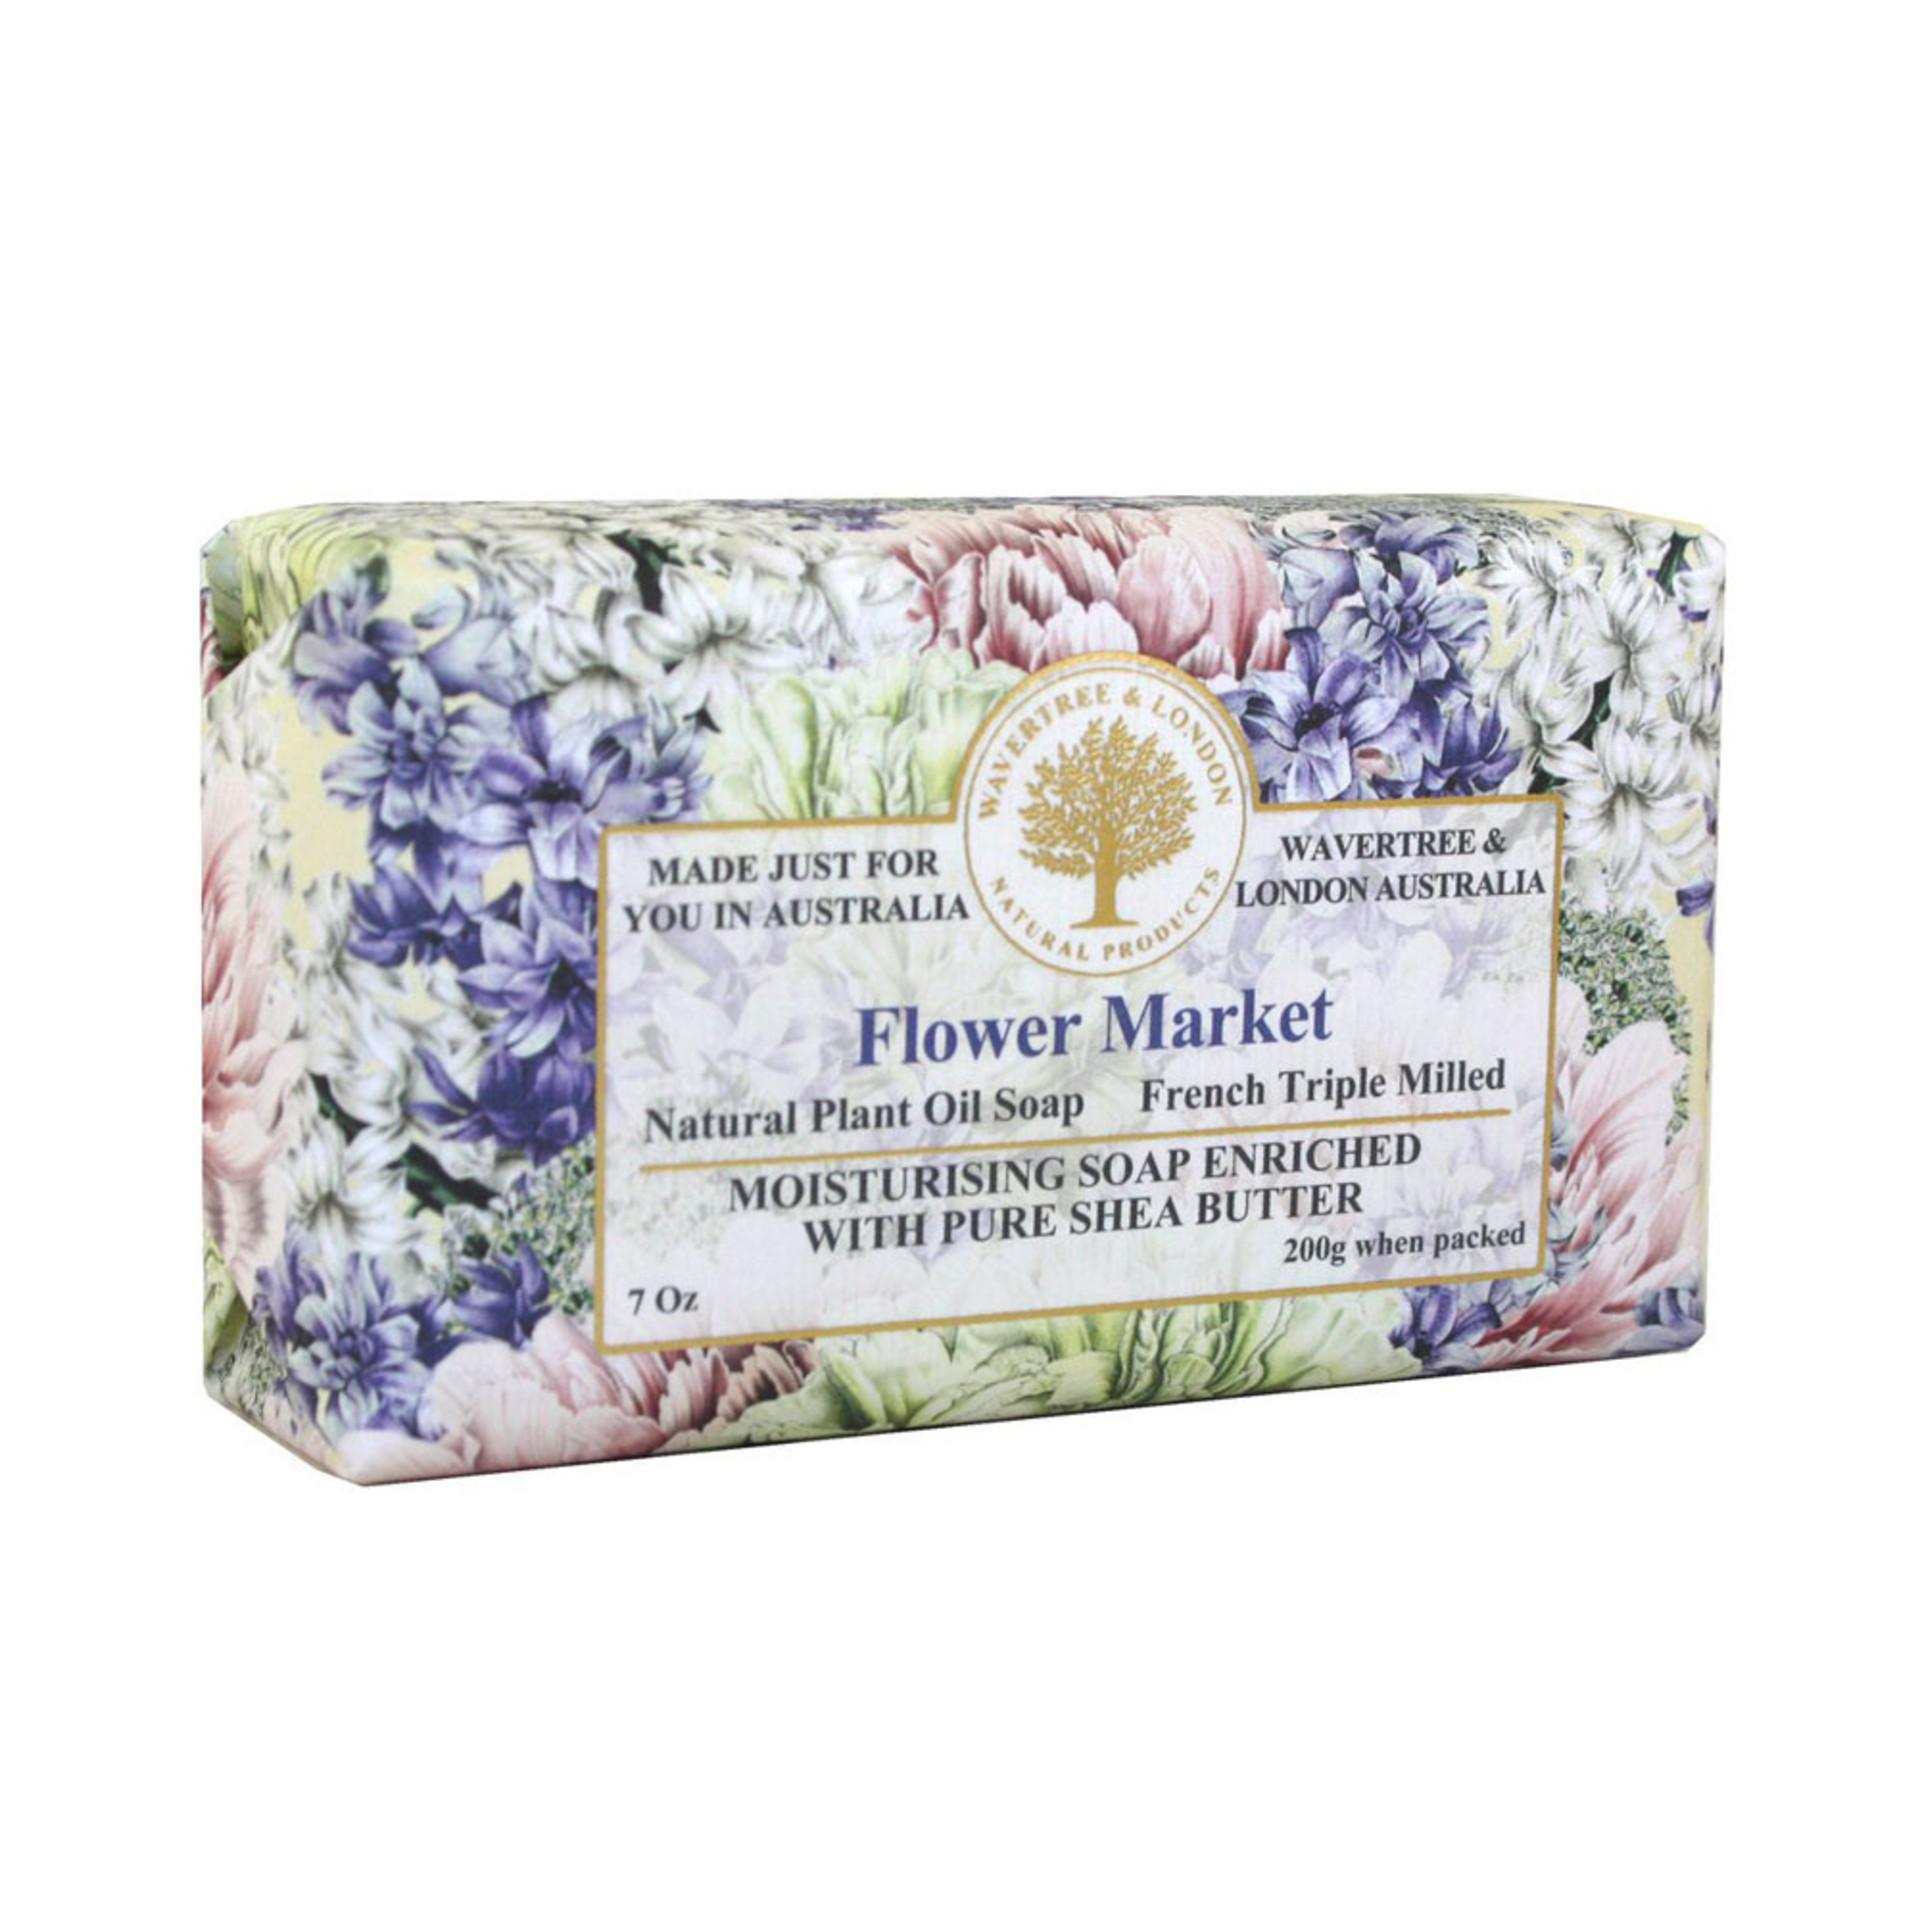 Flower Market Bar Soap